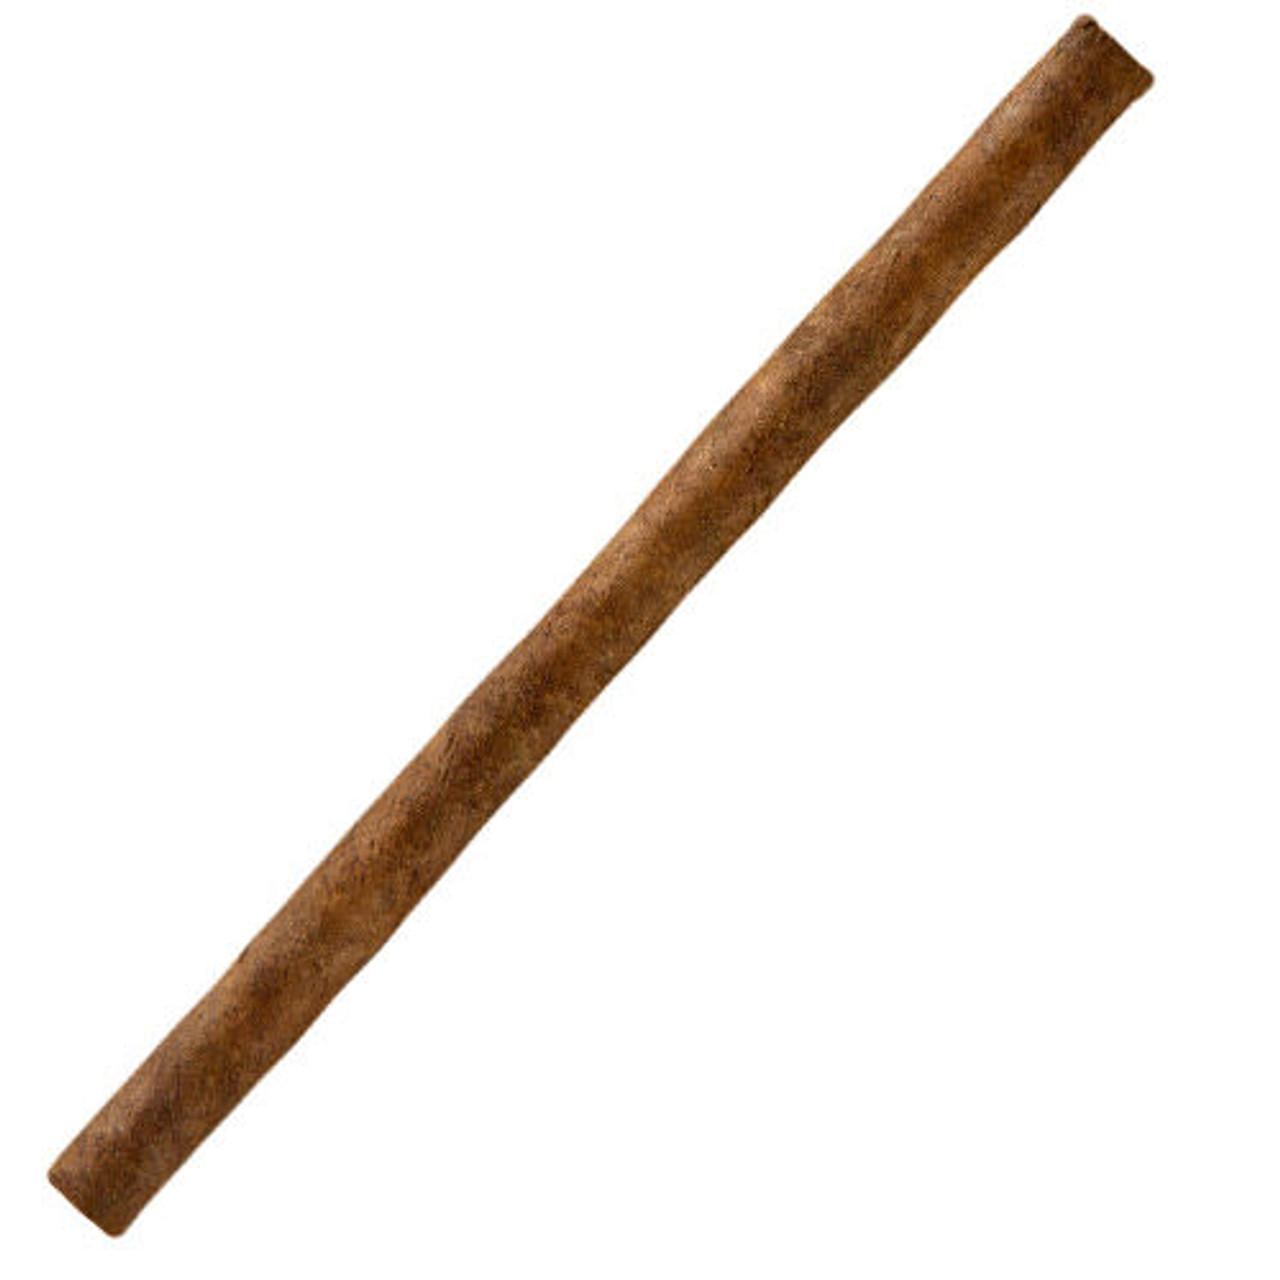 Villiger Braniff #3 Cigars (5 Packs of 10) - Maduro